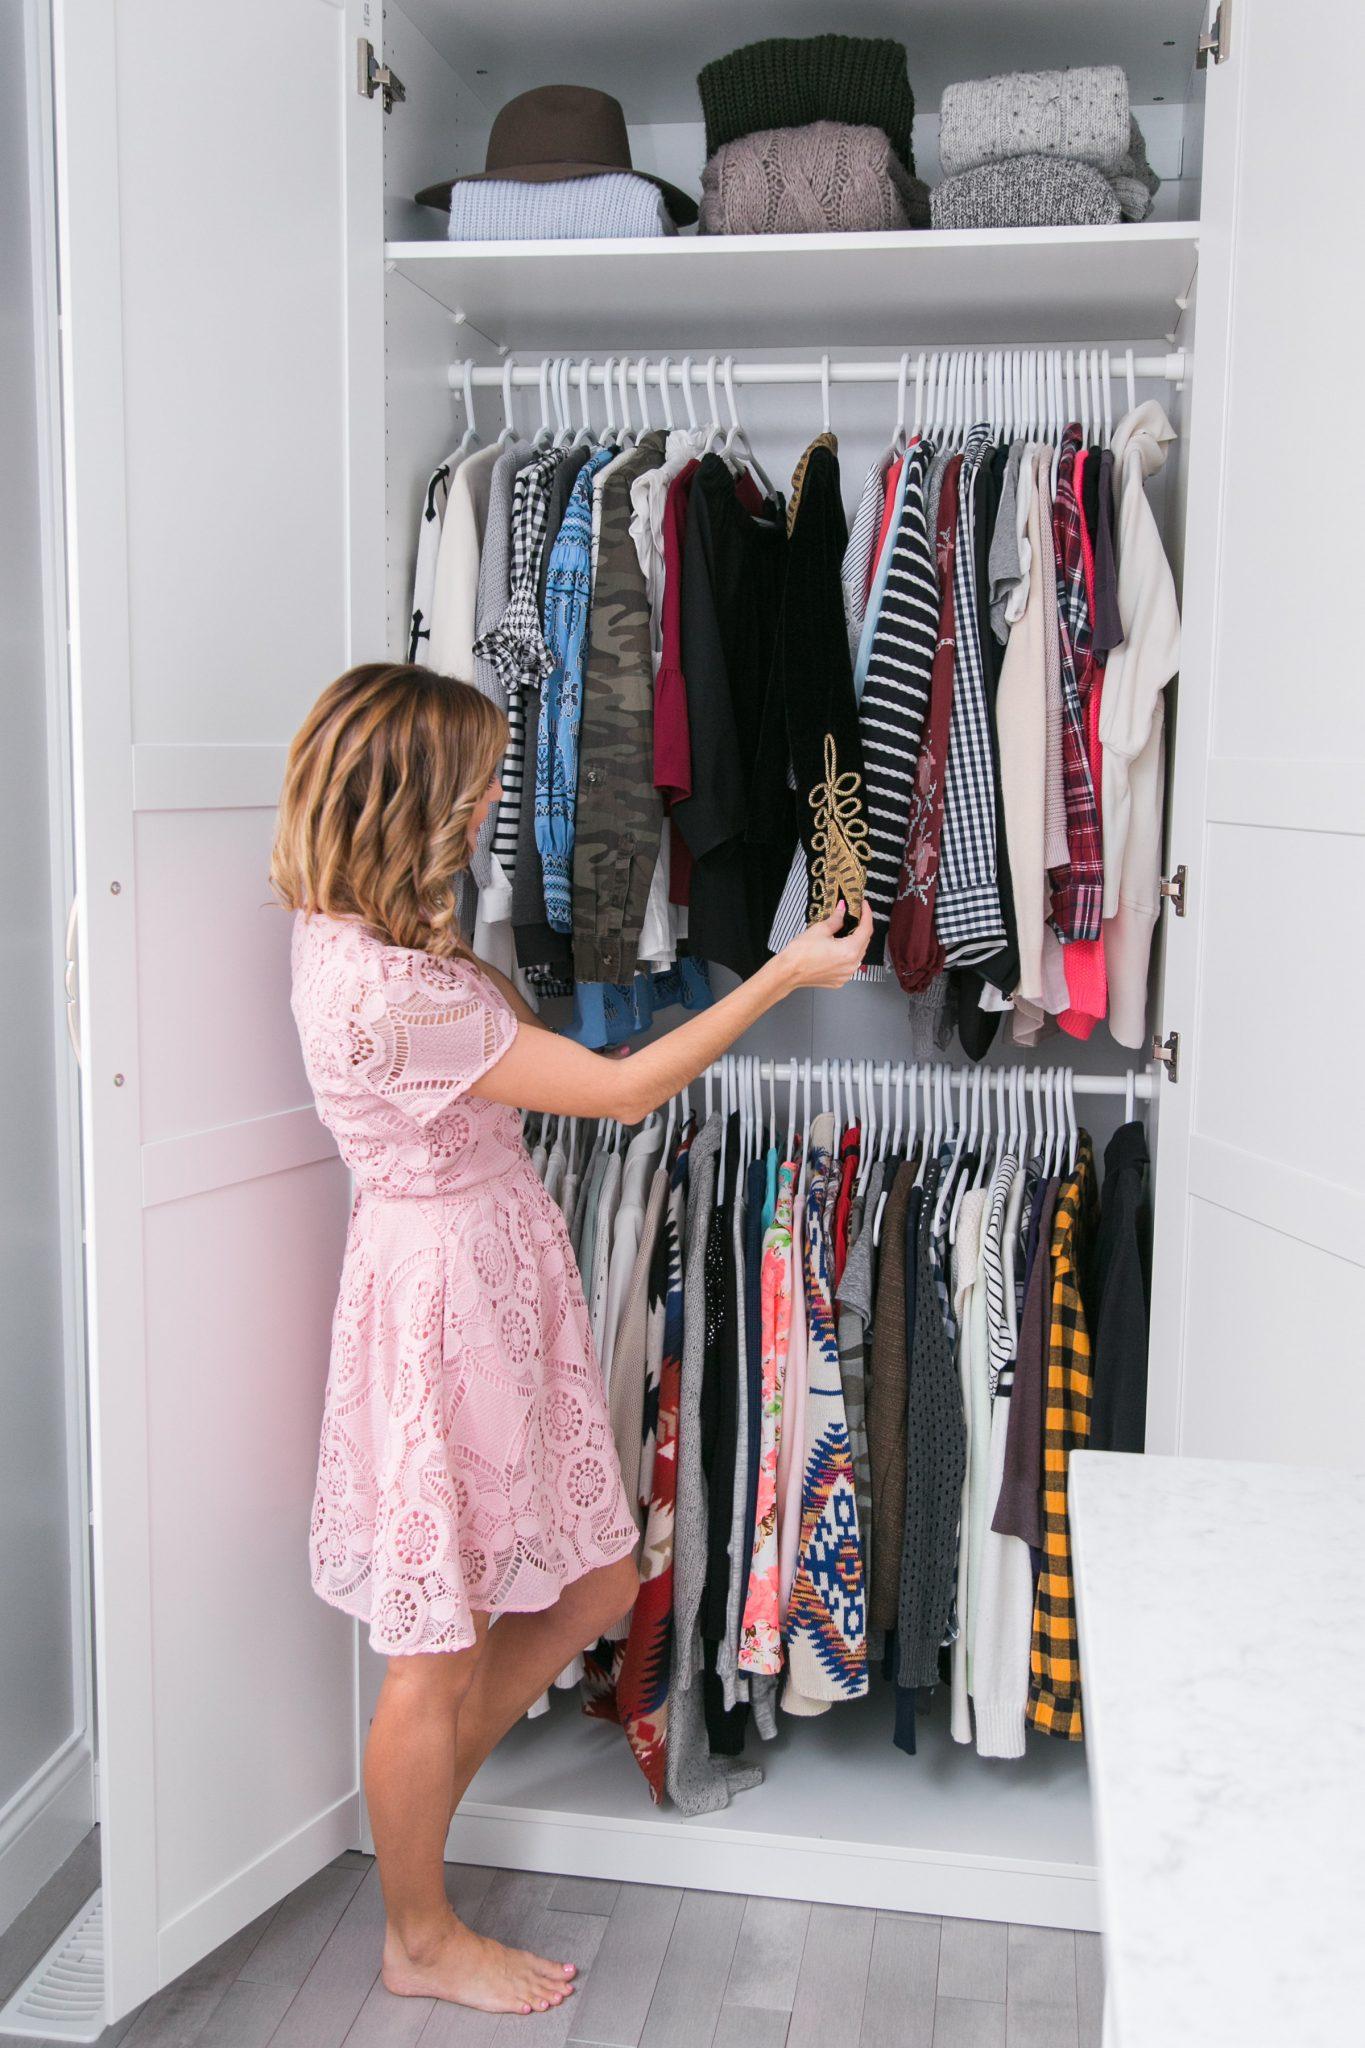 Ikea Closet Hack Tutorial sparkleshinylove